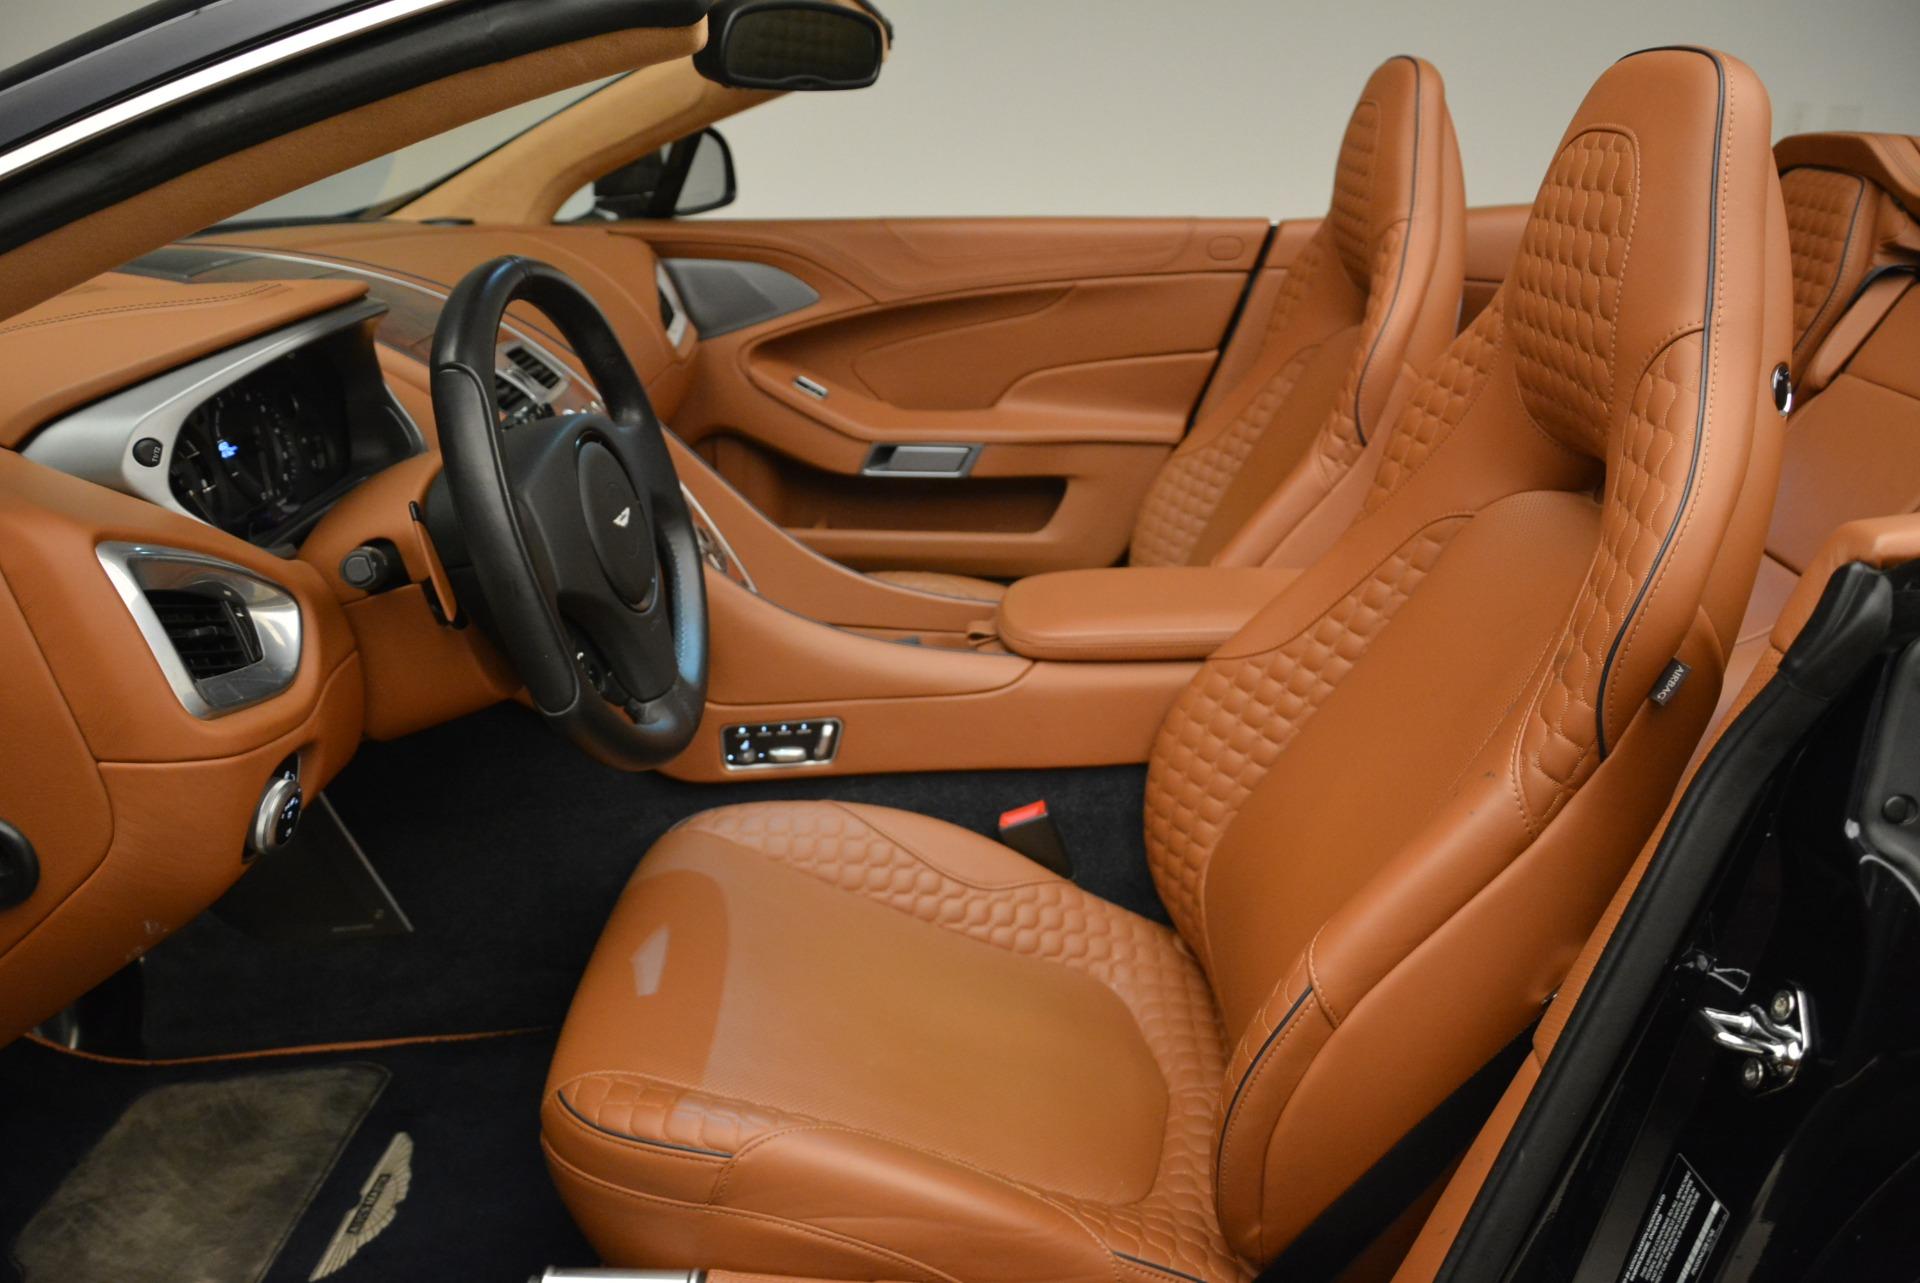 Used 2014 Aston Martin Vanquish Volante For Sale In Greenwich, CT 2097_p21